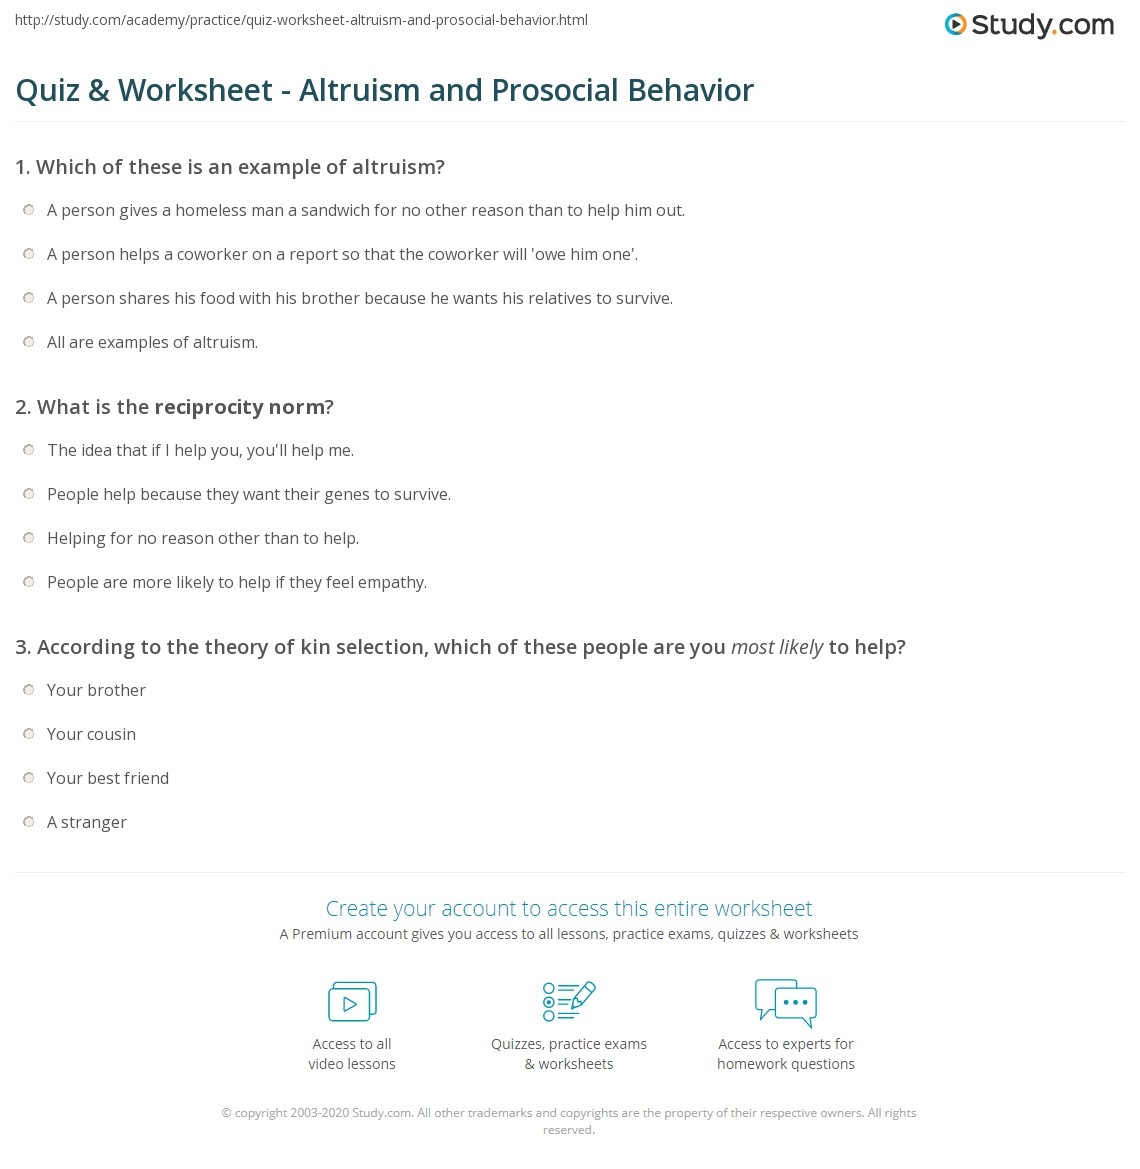 quiz & worksheet - altruism and prosocial behavior | study